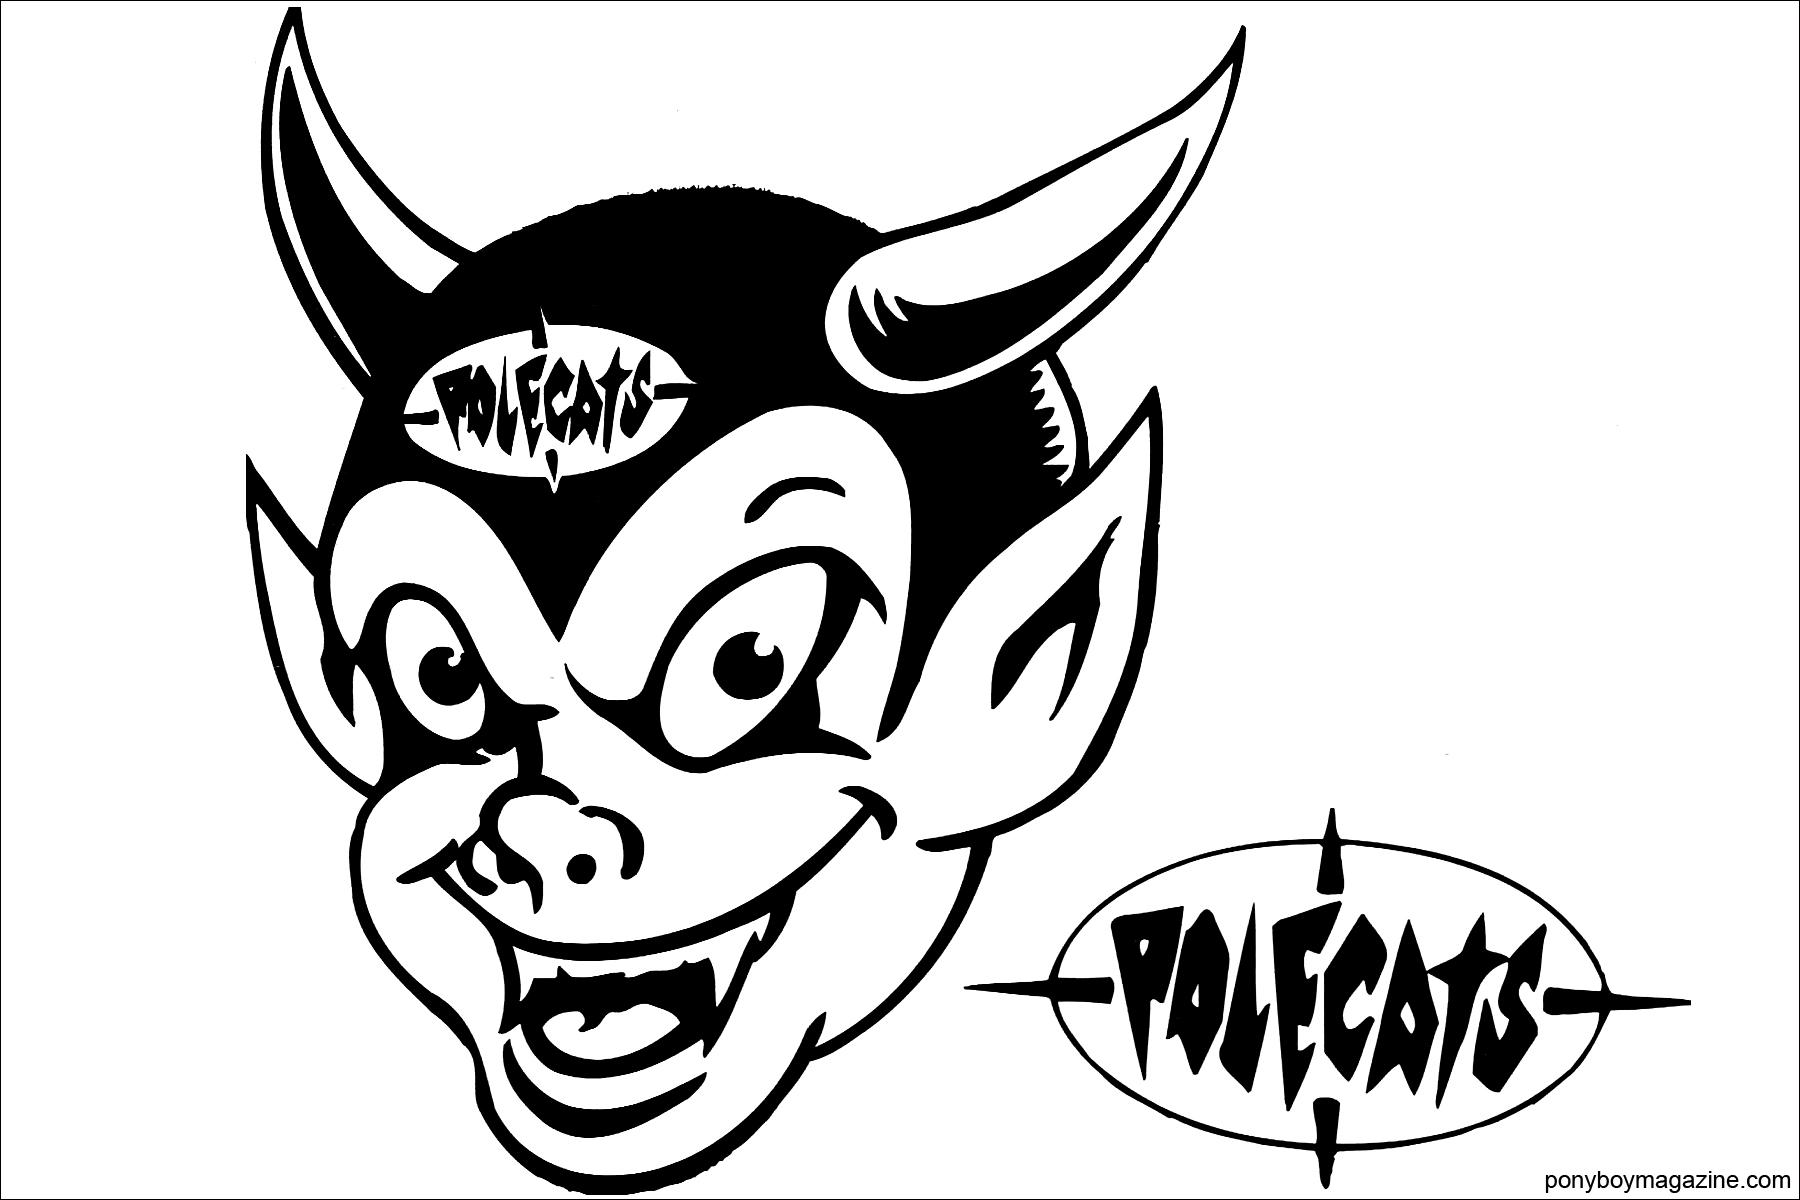 A Polecats logo. Ponyboy Magazine.